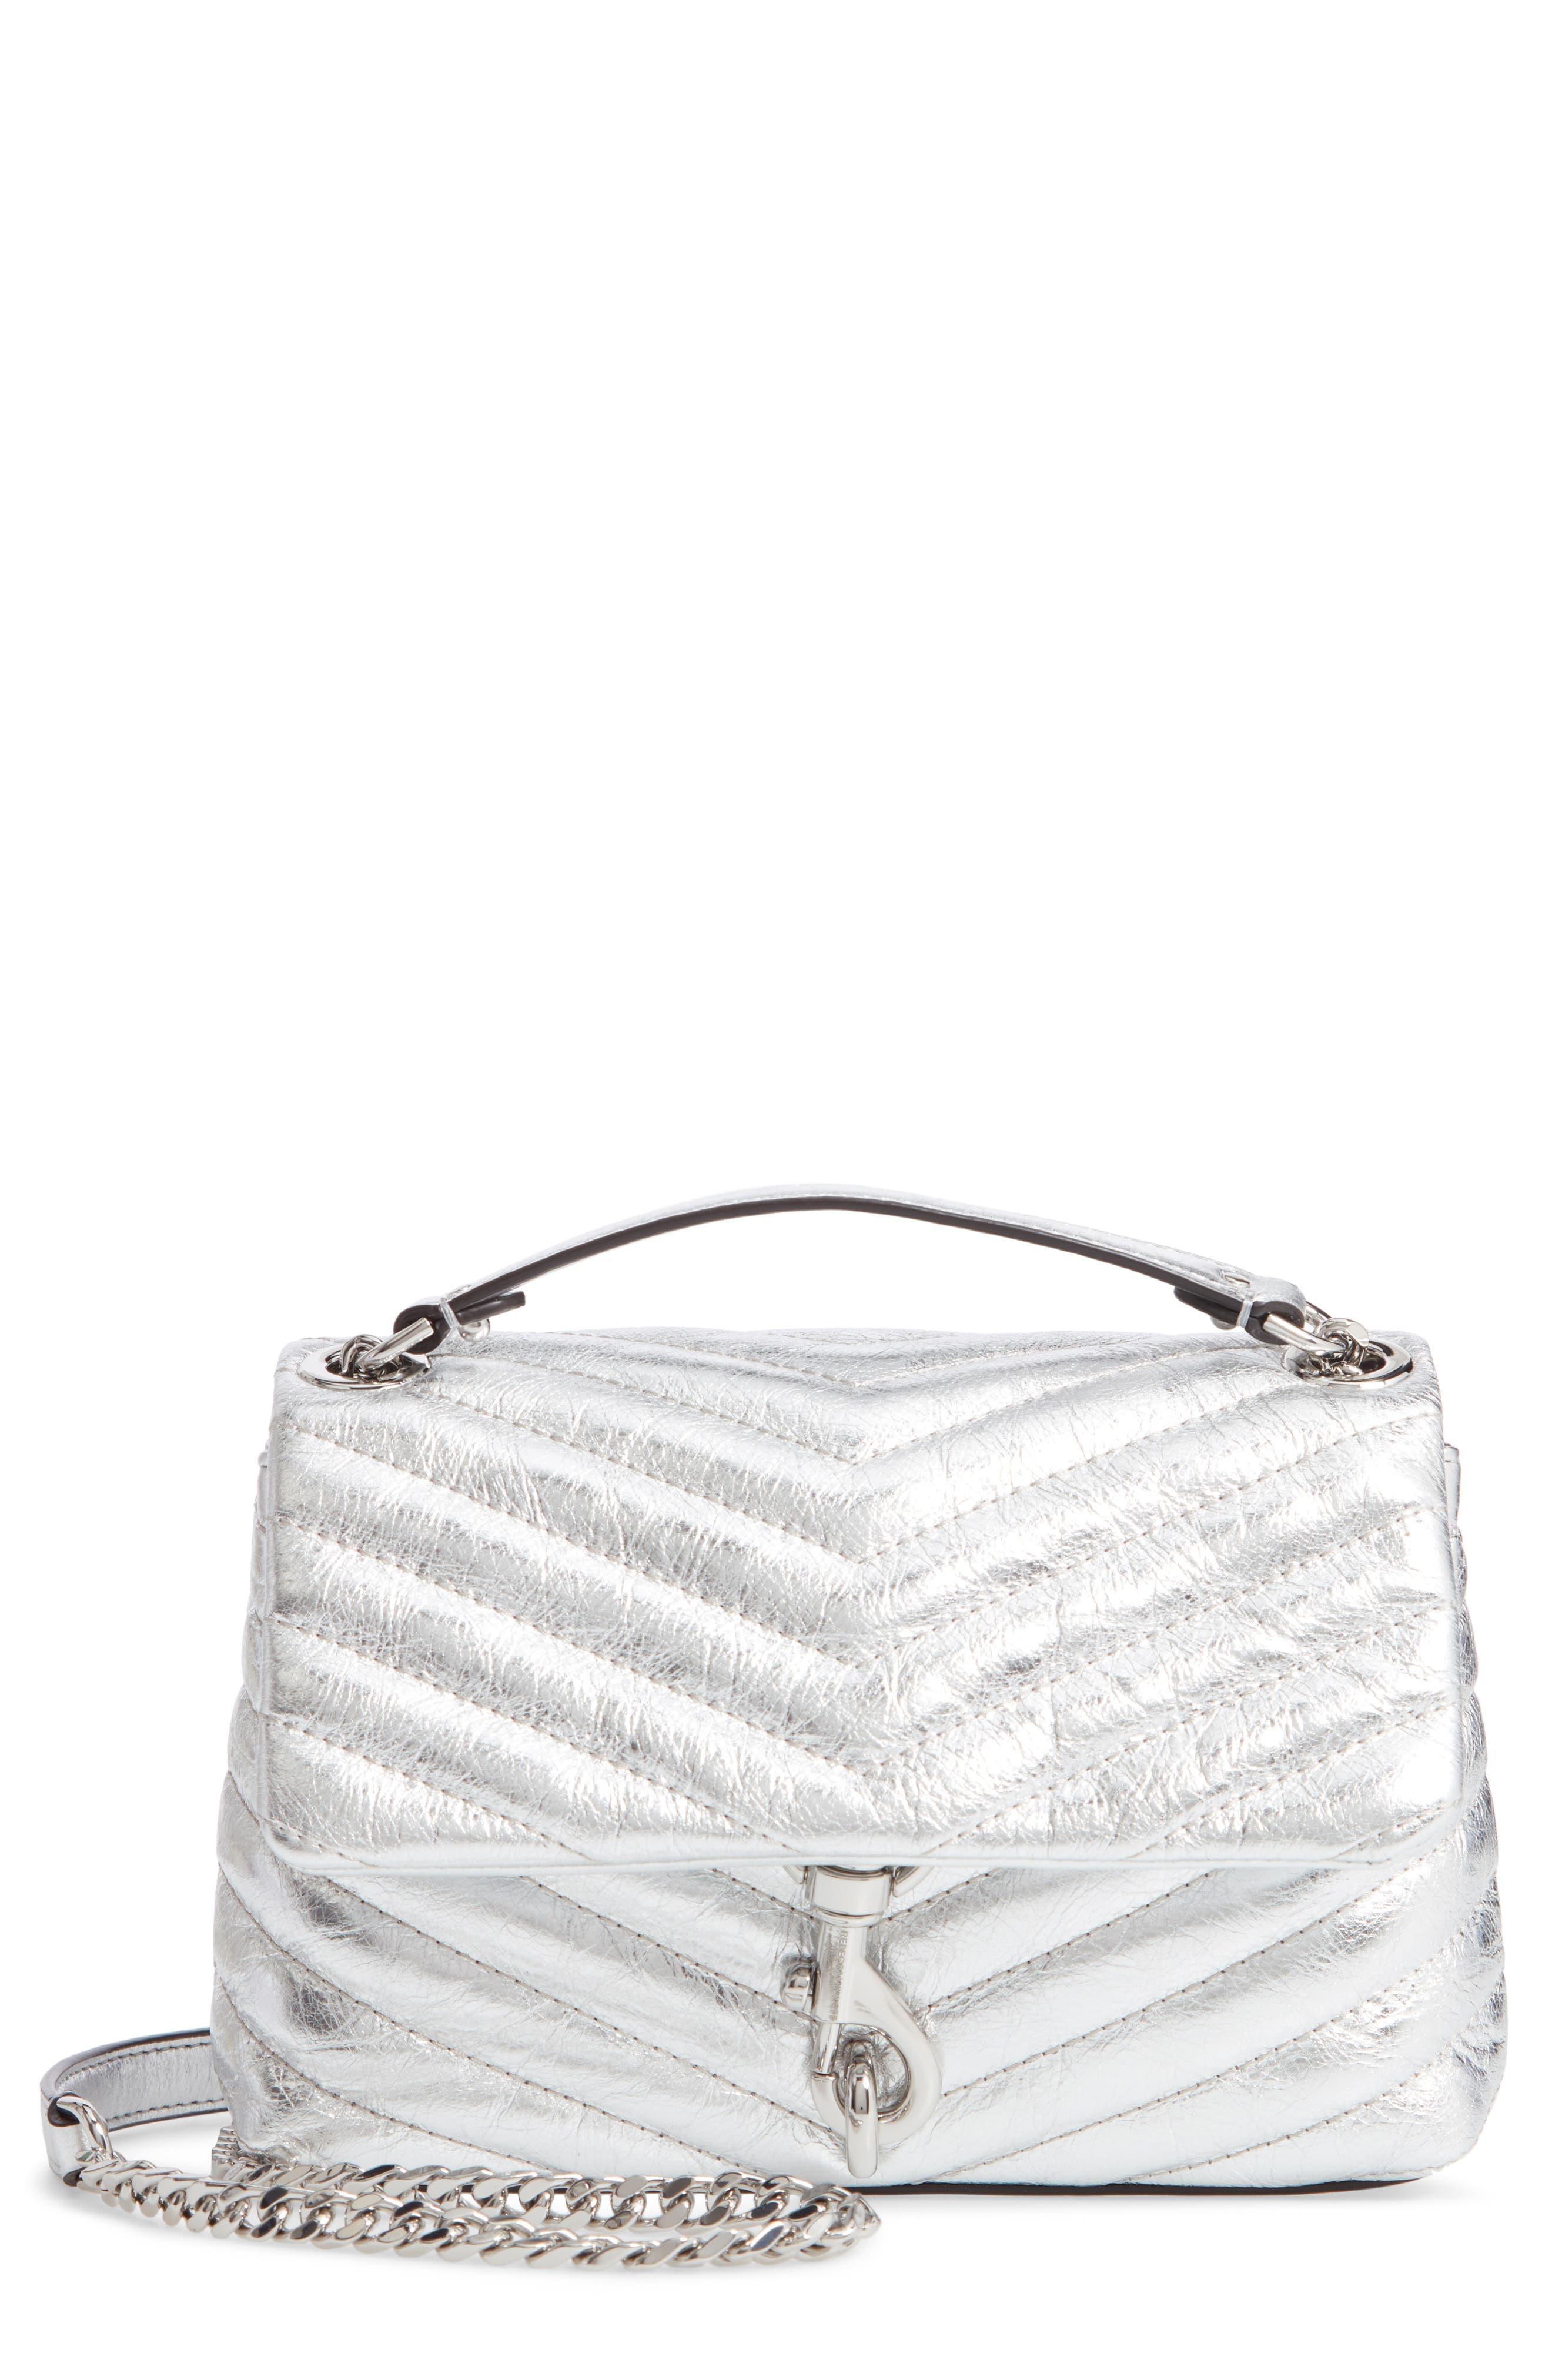 Edie Metallic Leather Shoulder Bag,                             Main thumbnail 1, color,                             SILVER